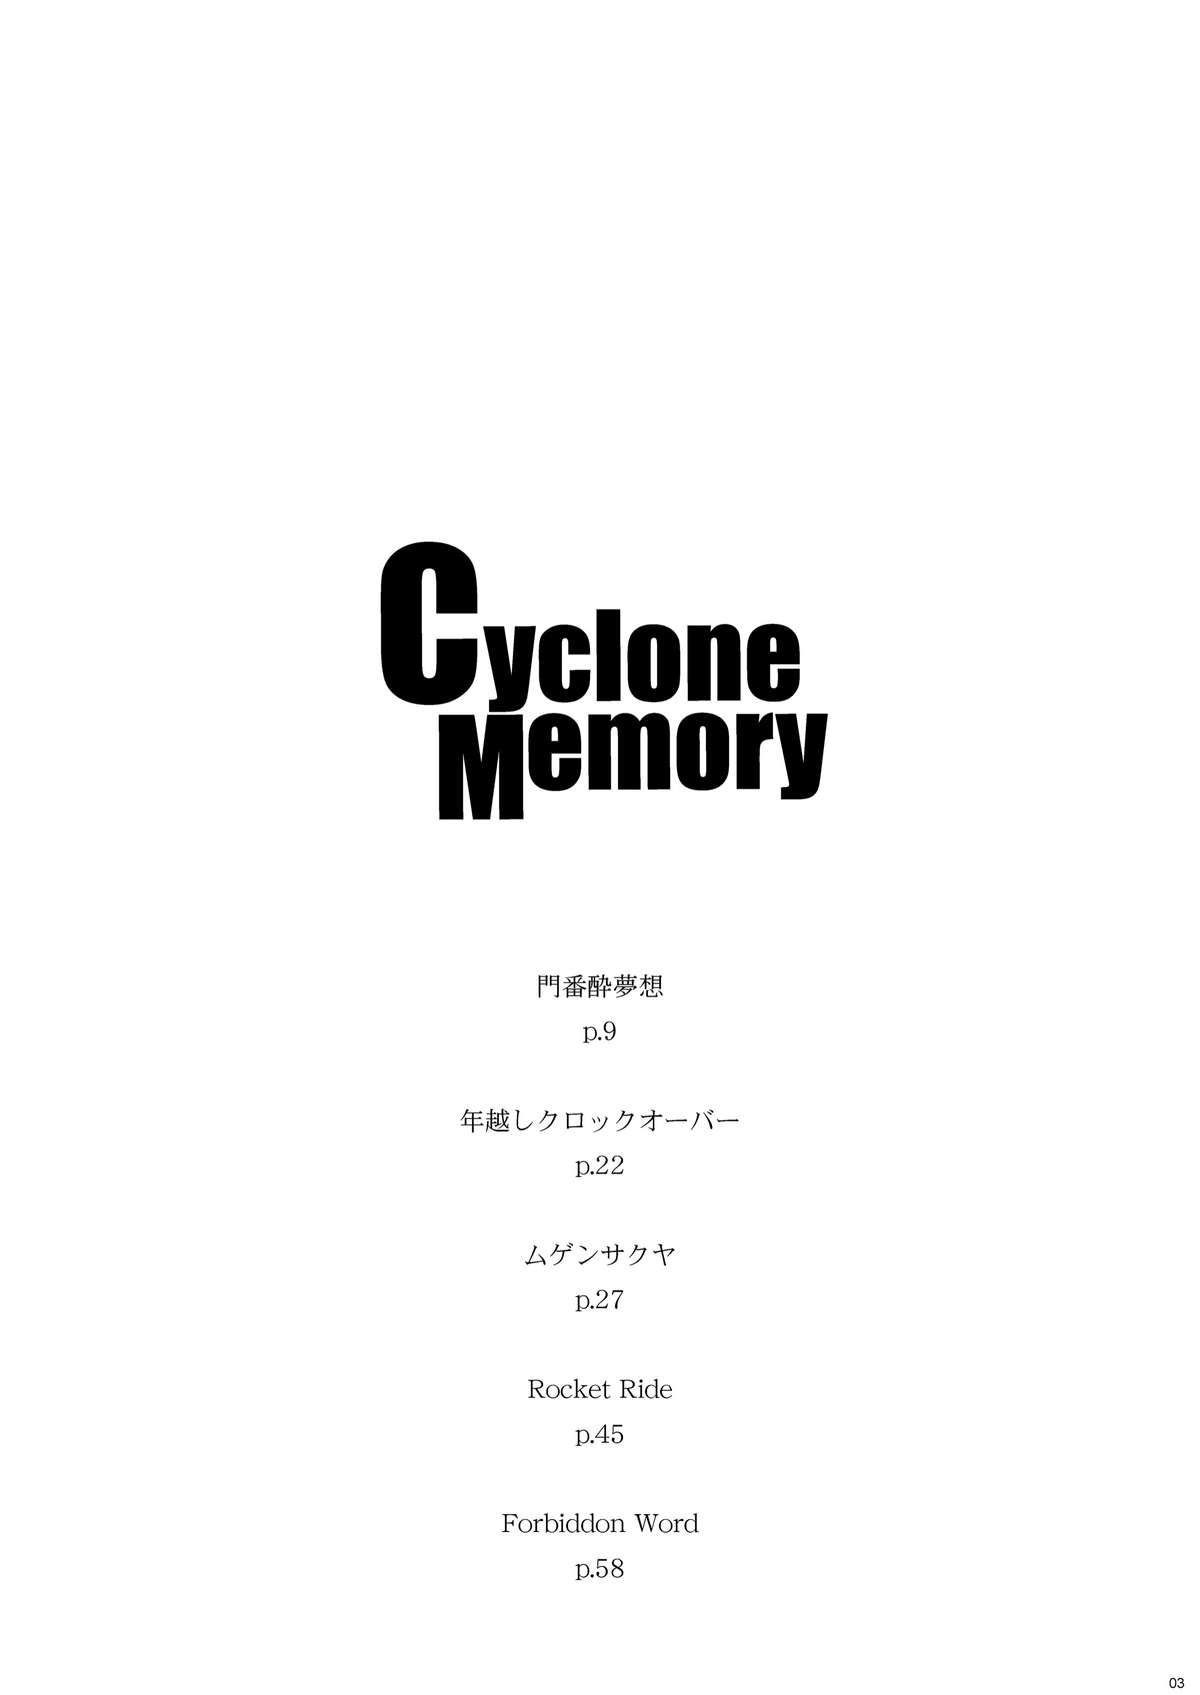 Cyclone Memory 2